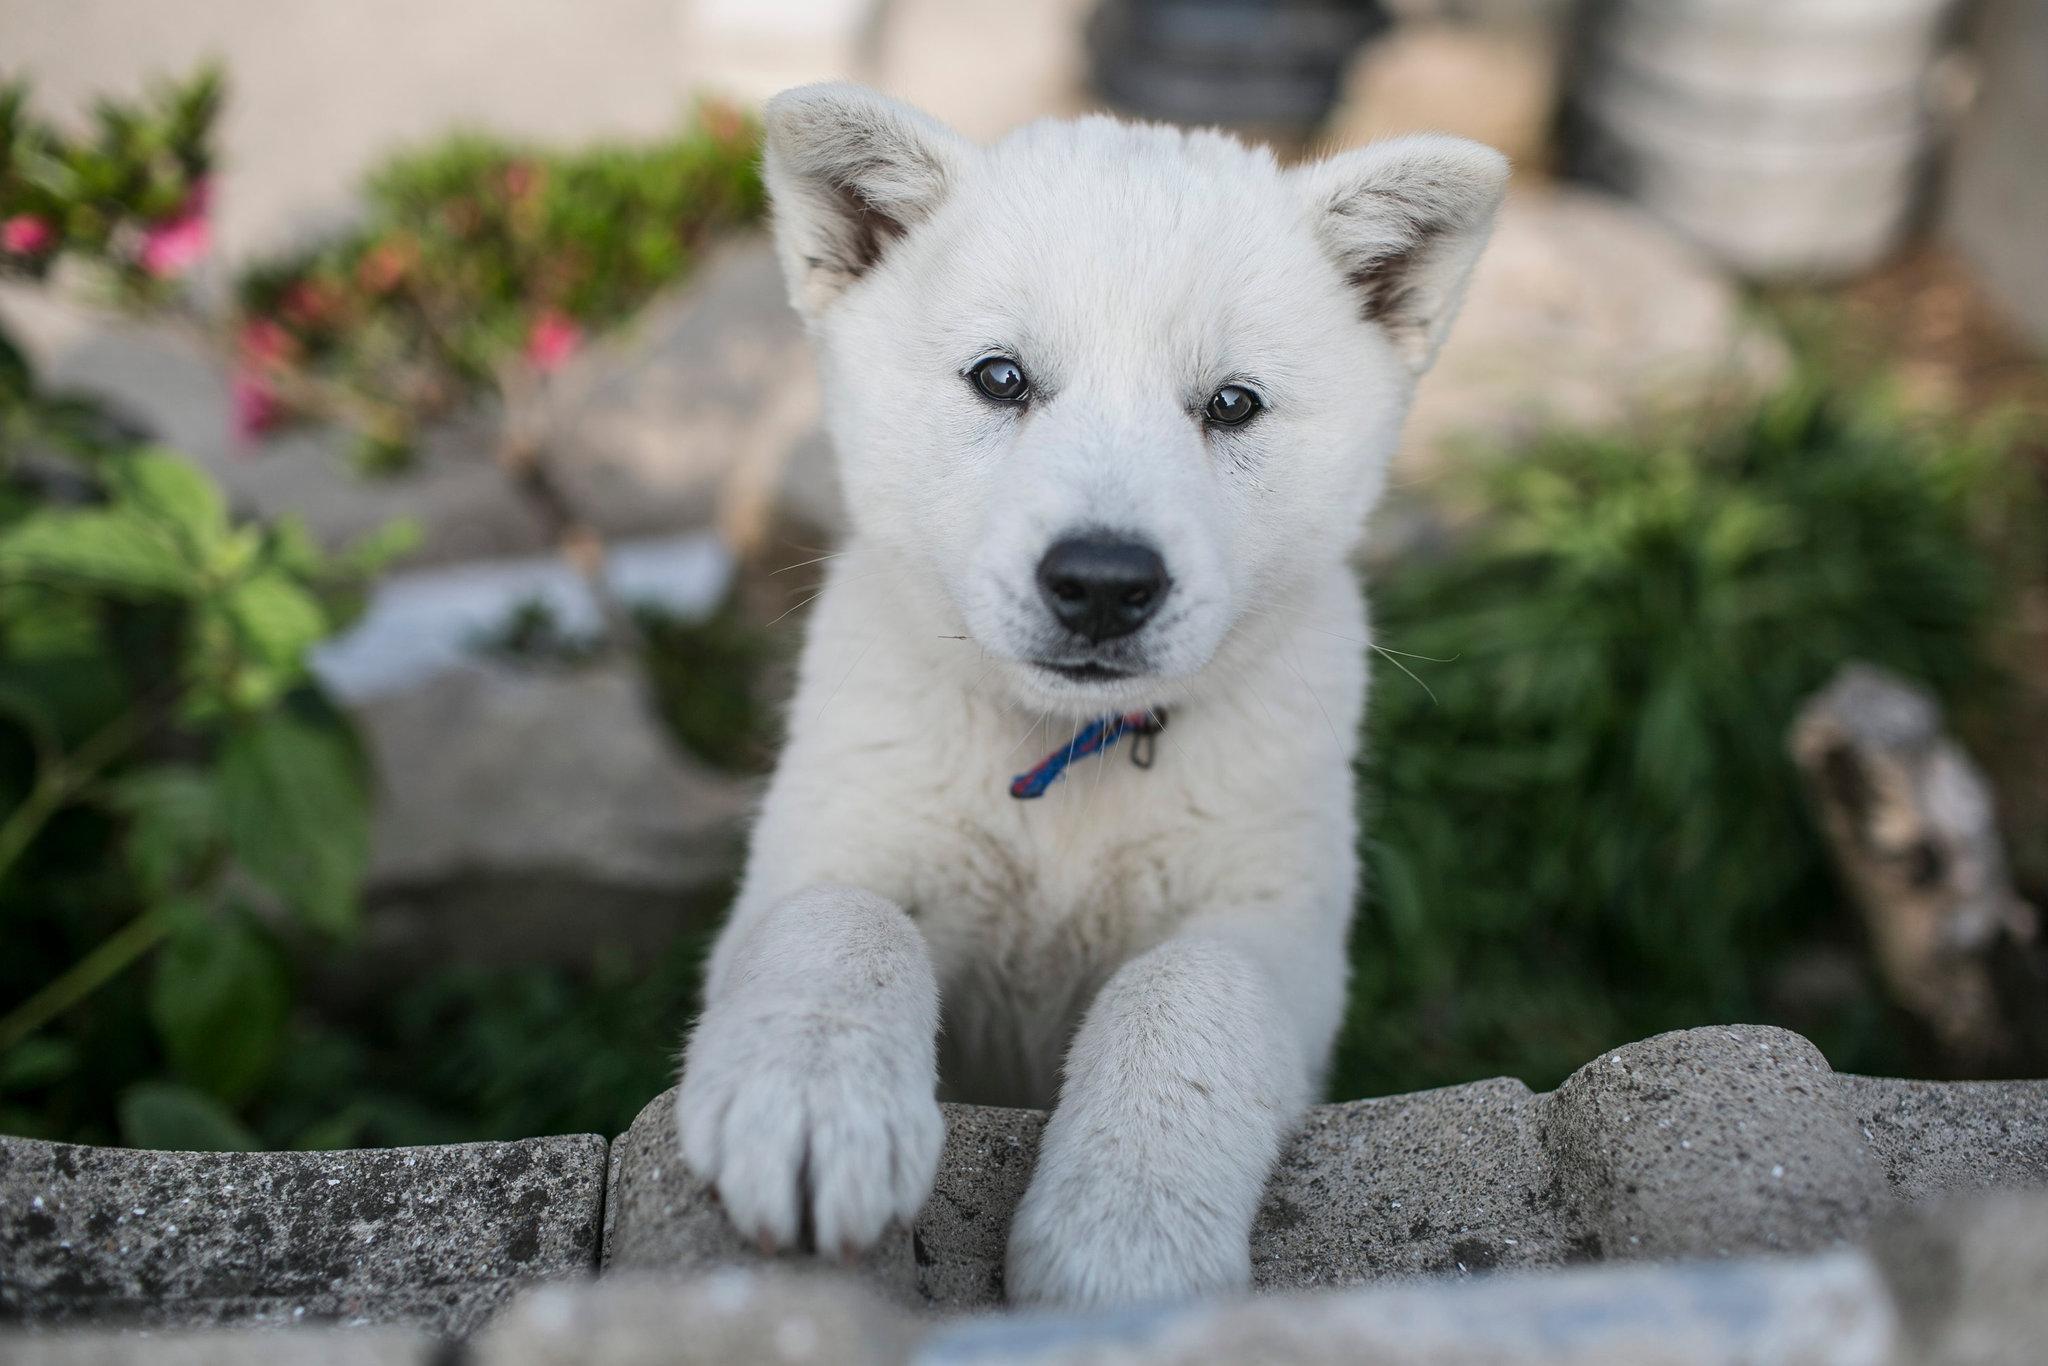 Fullsize Of Most Loyal Dog Breeds